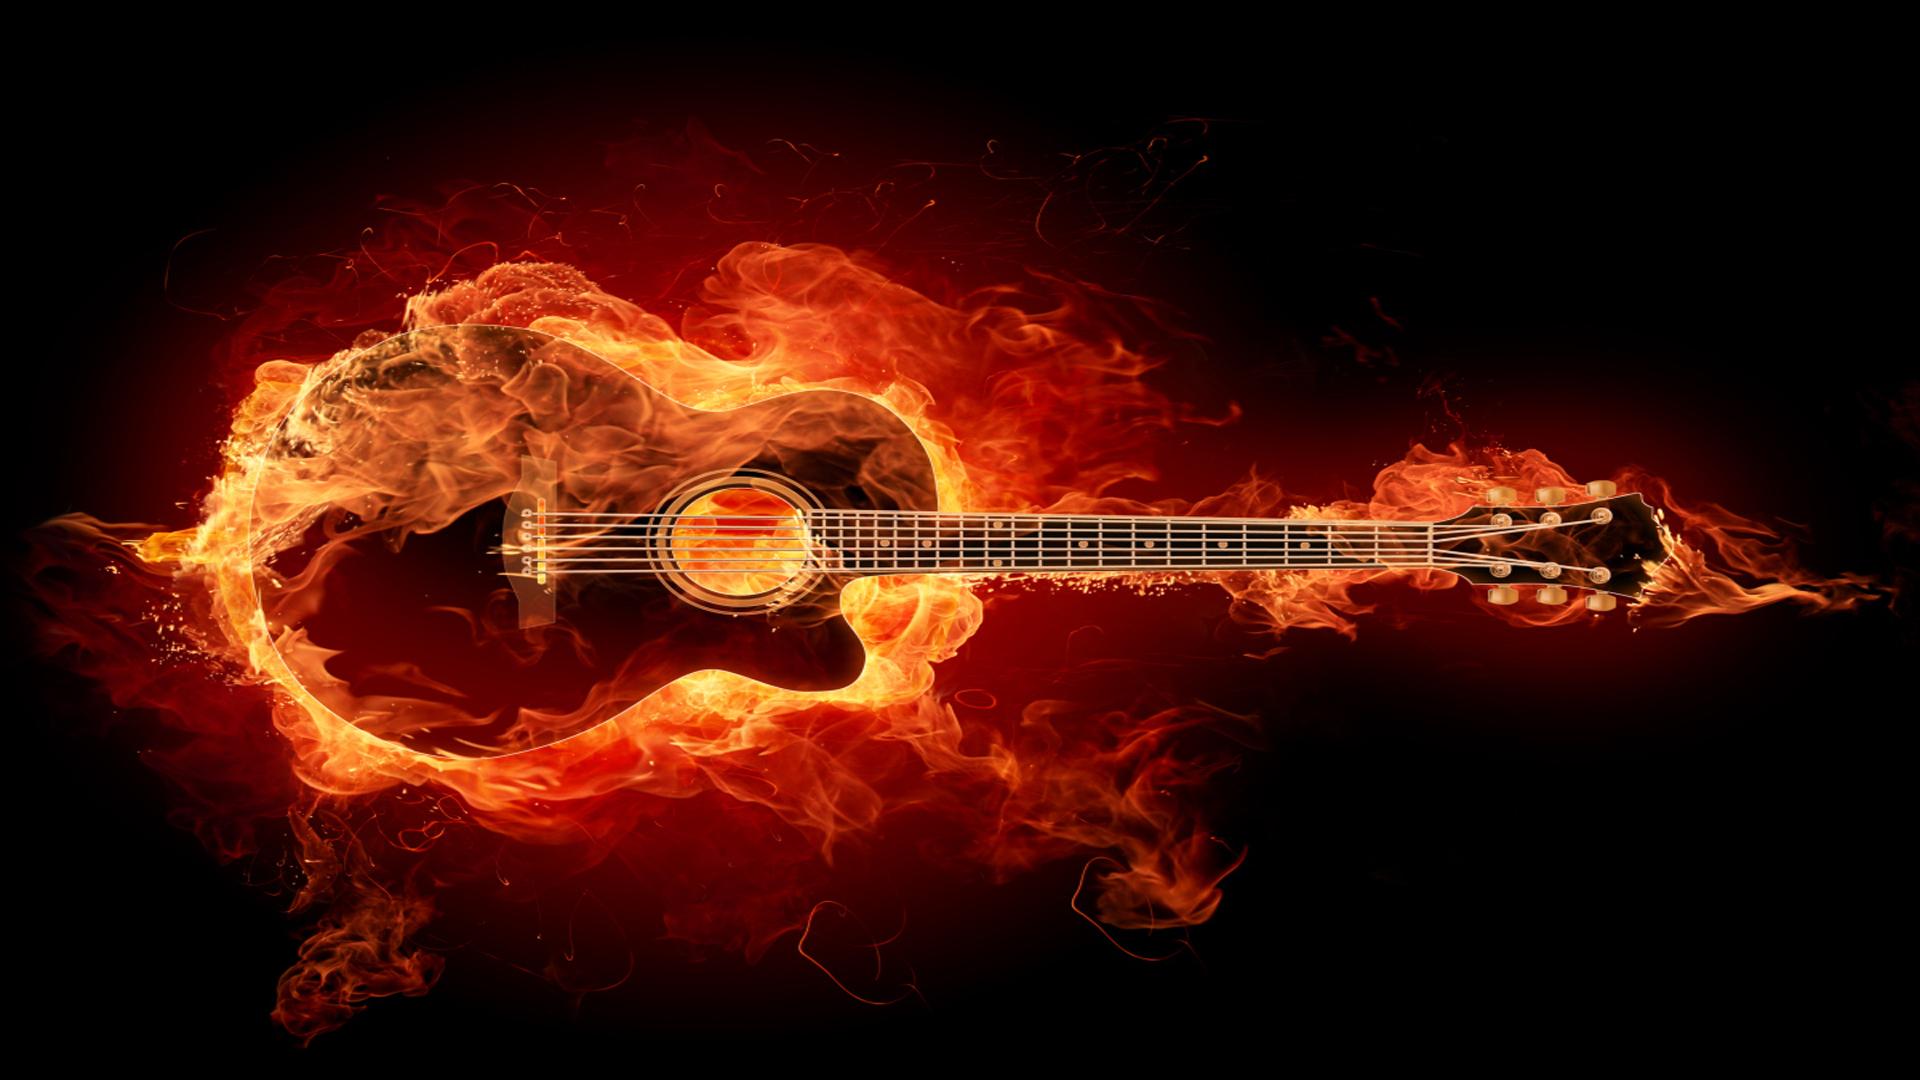 guitar wallpaper widescreen - photo #34